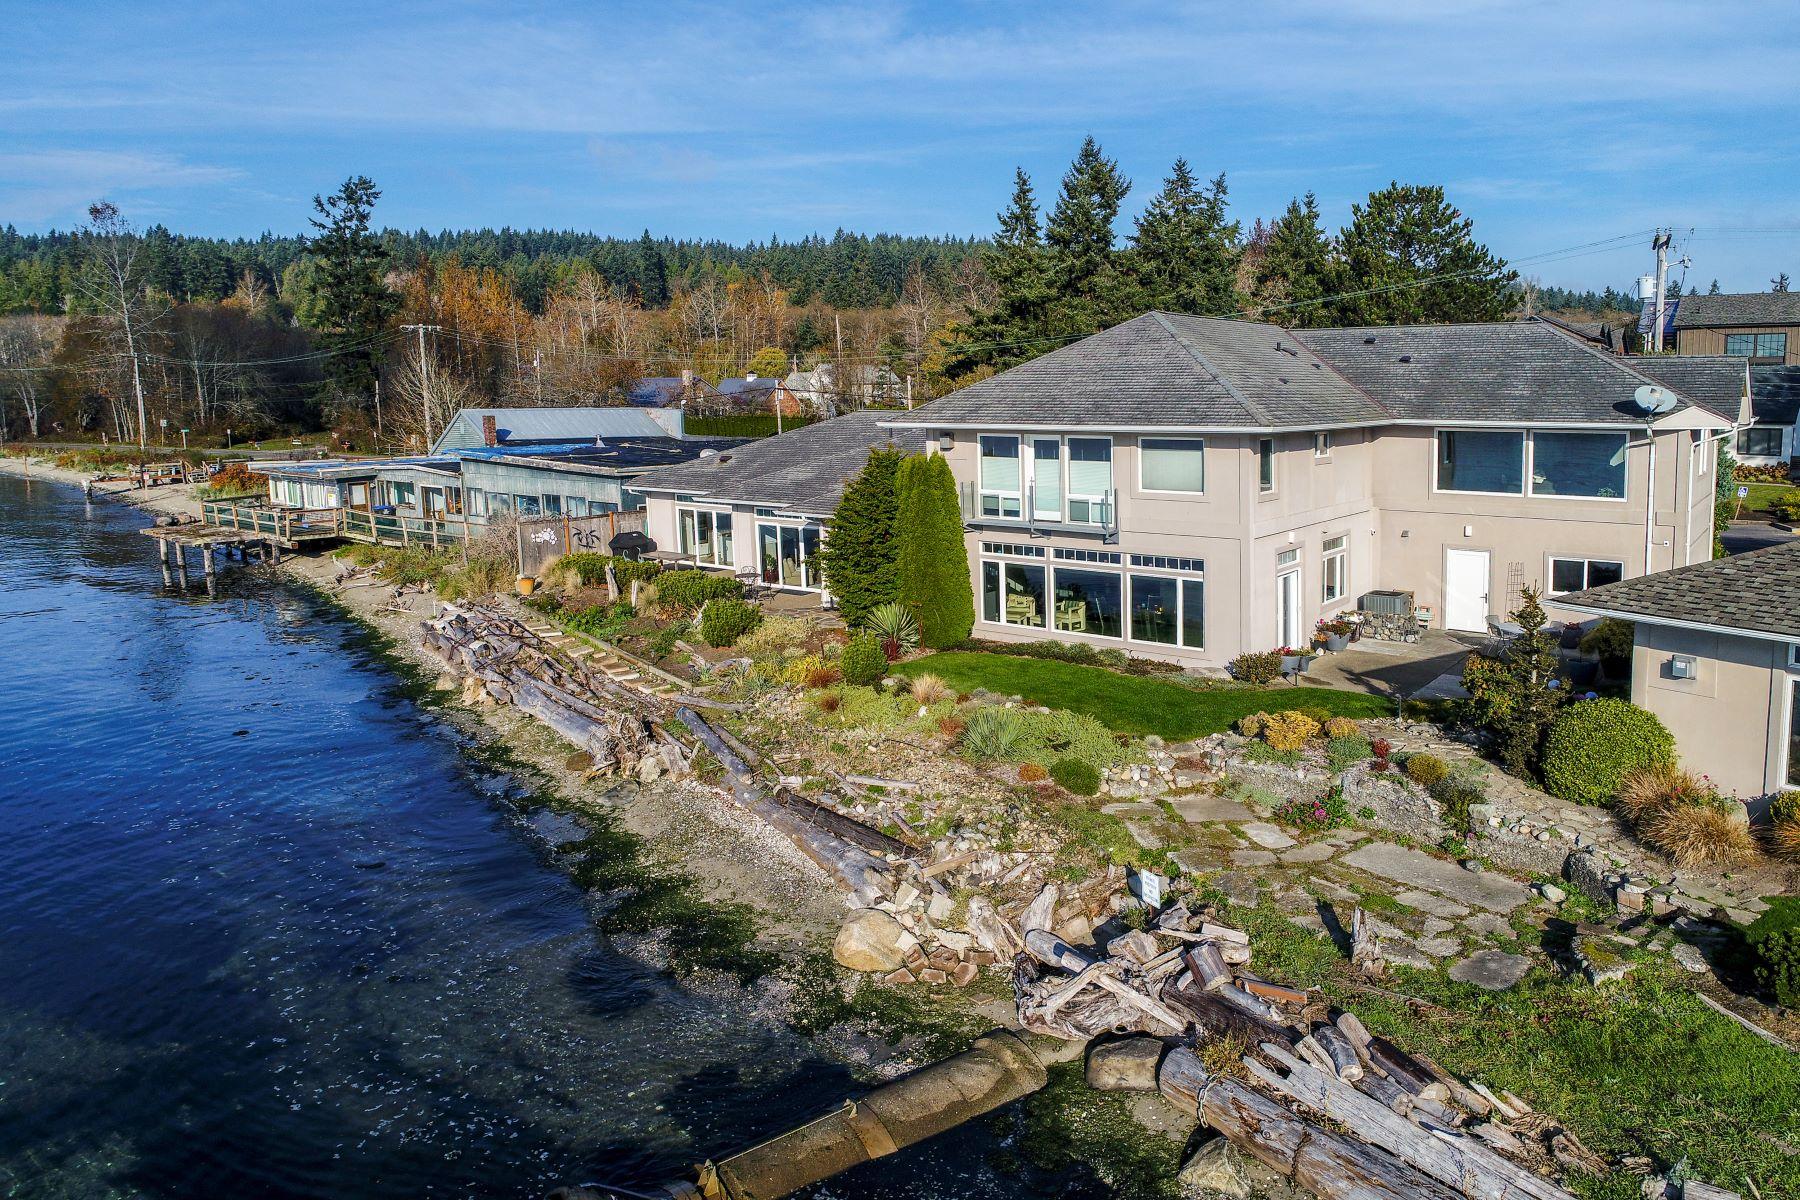 Single Family Homes for Sale at 4576 Point White Drive NE, Bainbridge Island, WA 98110 4576 Point White Drive NE Bainbridge Island, Washington 98110 United States